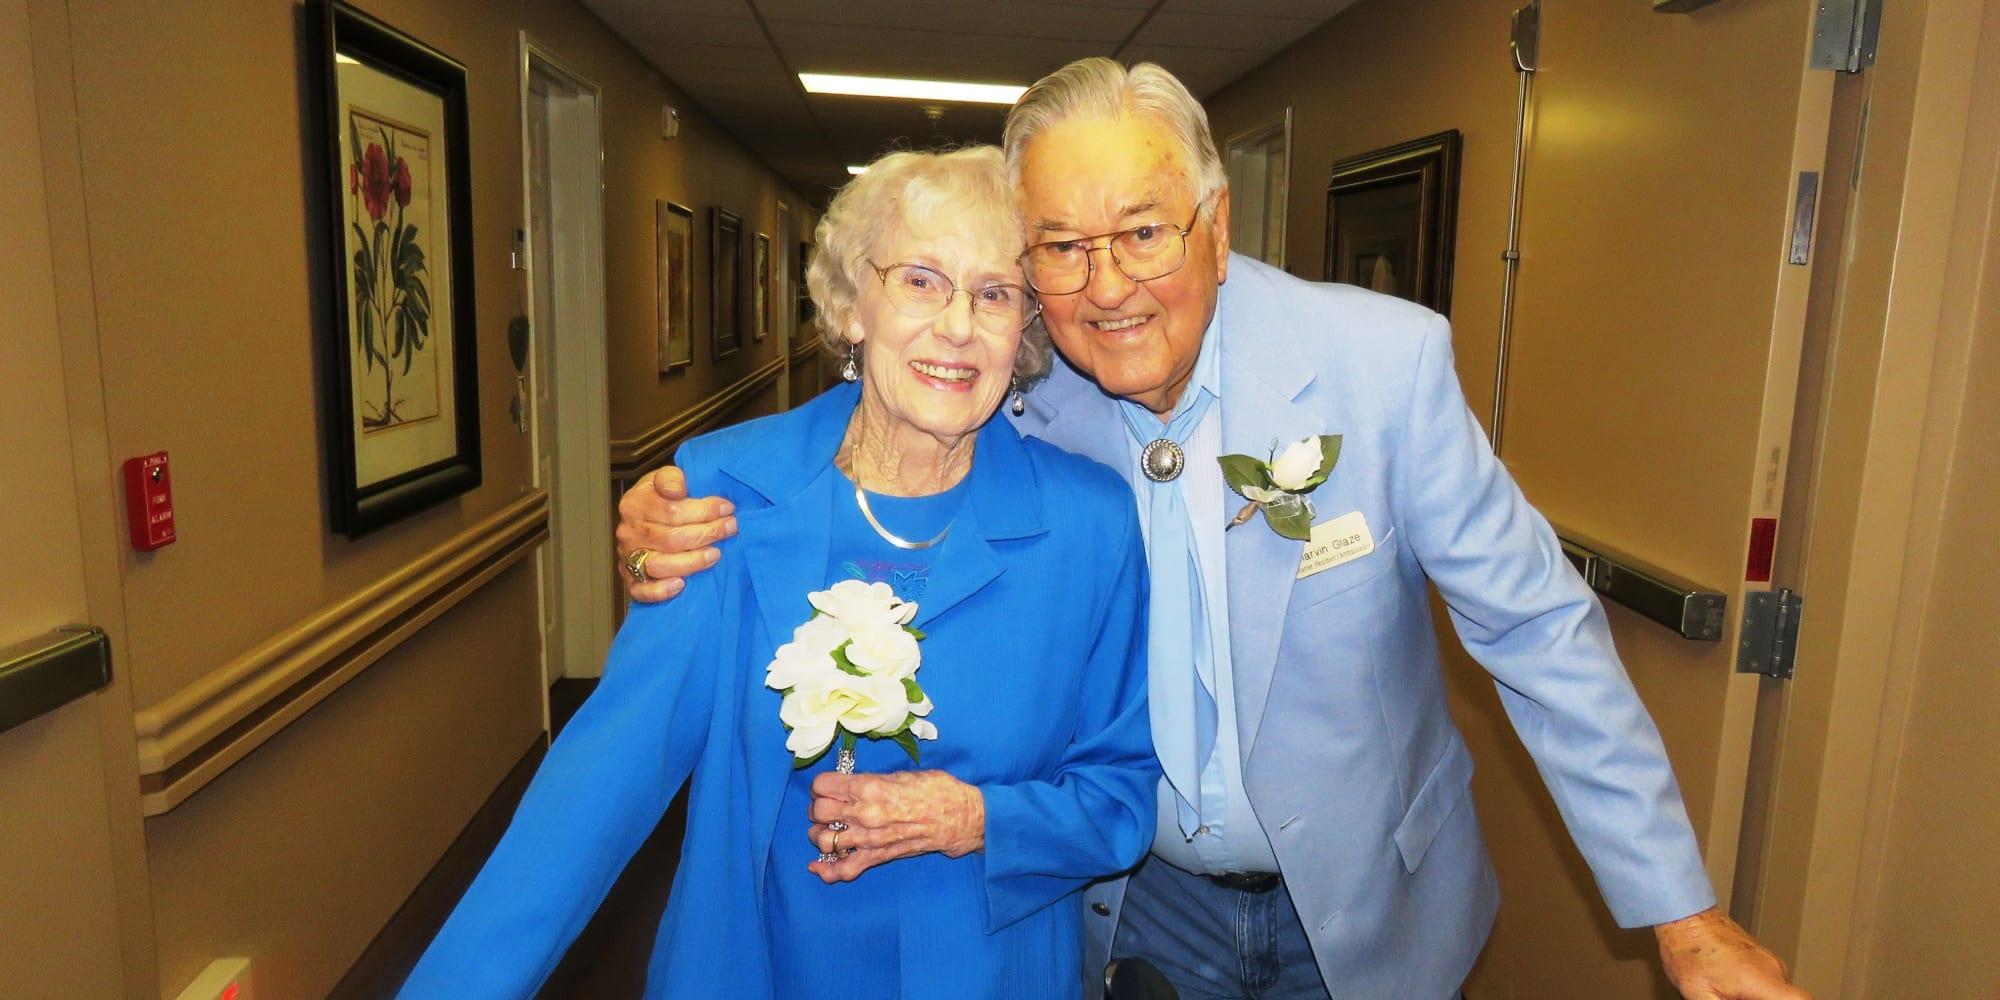 An elderly couple at Camden Springs Gracious Retirement Living in Elk Grove, California